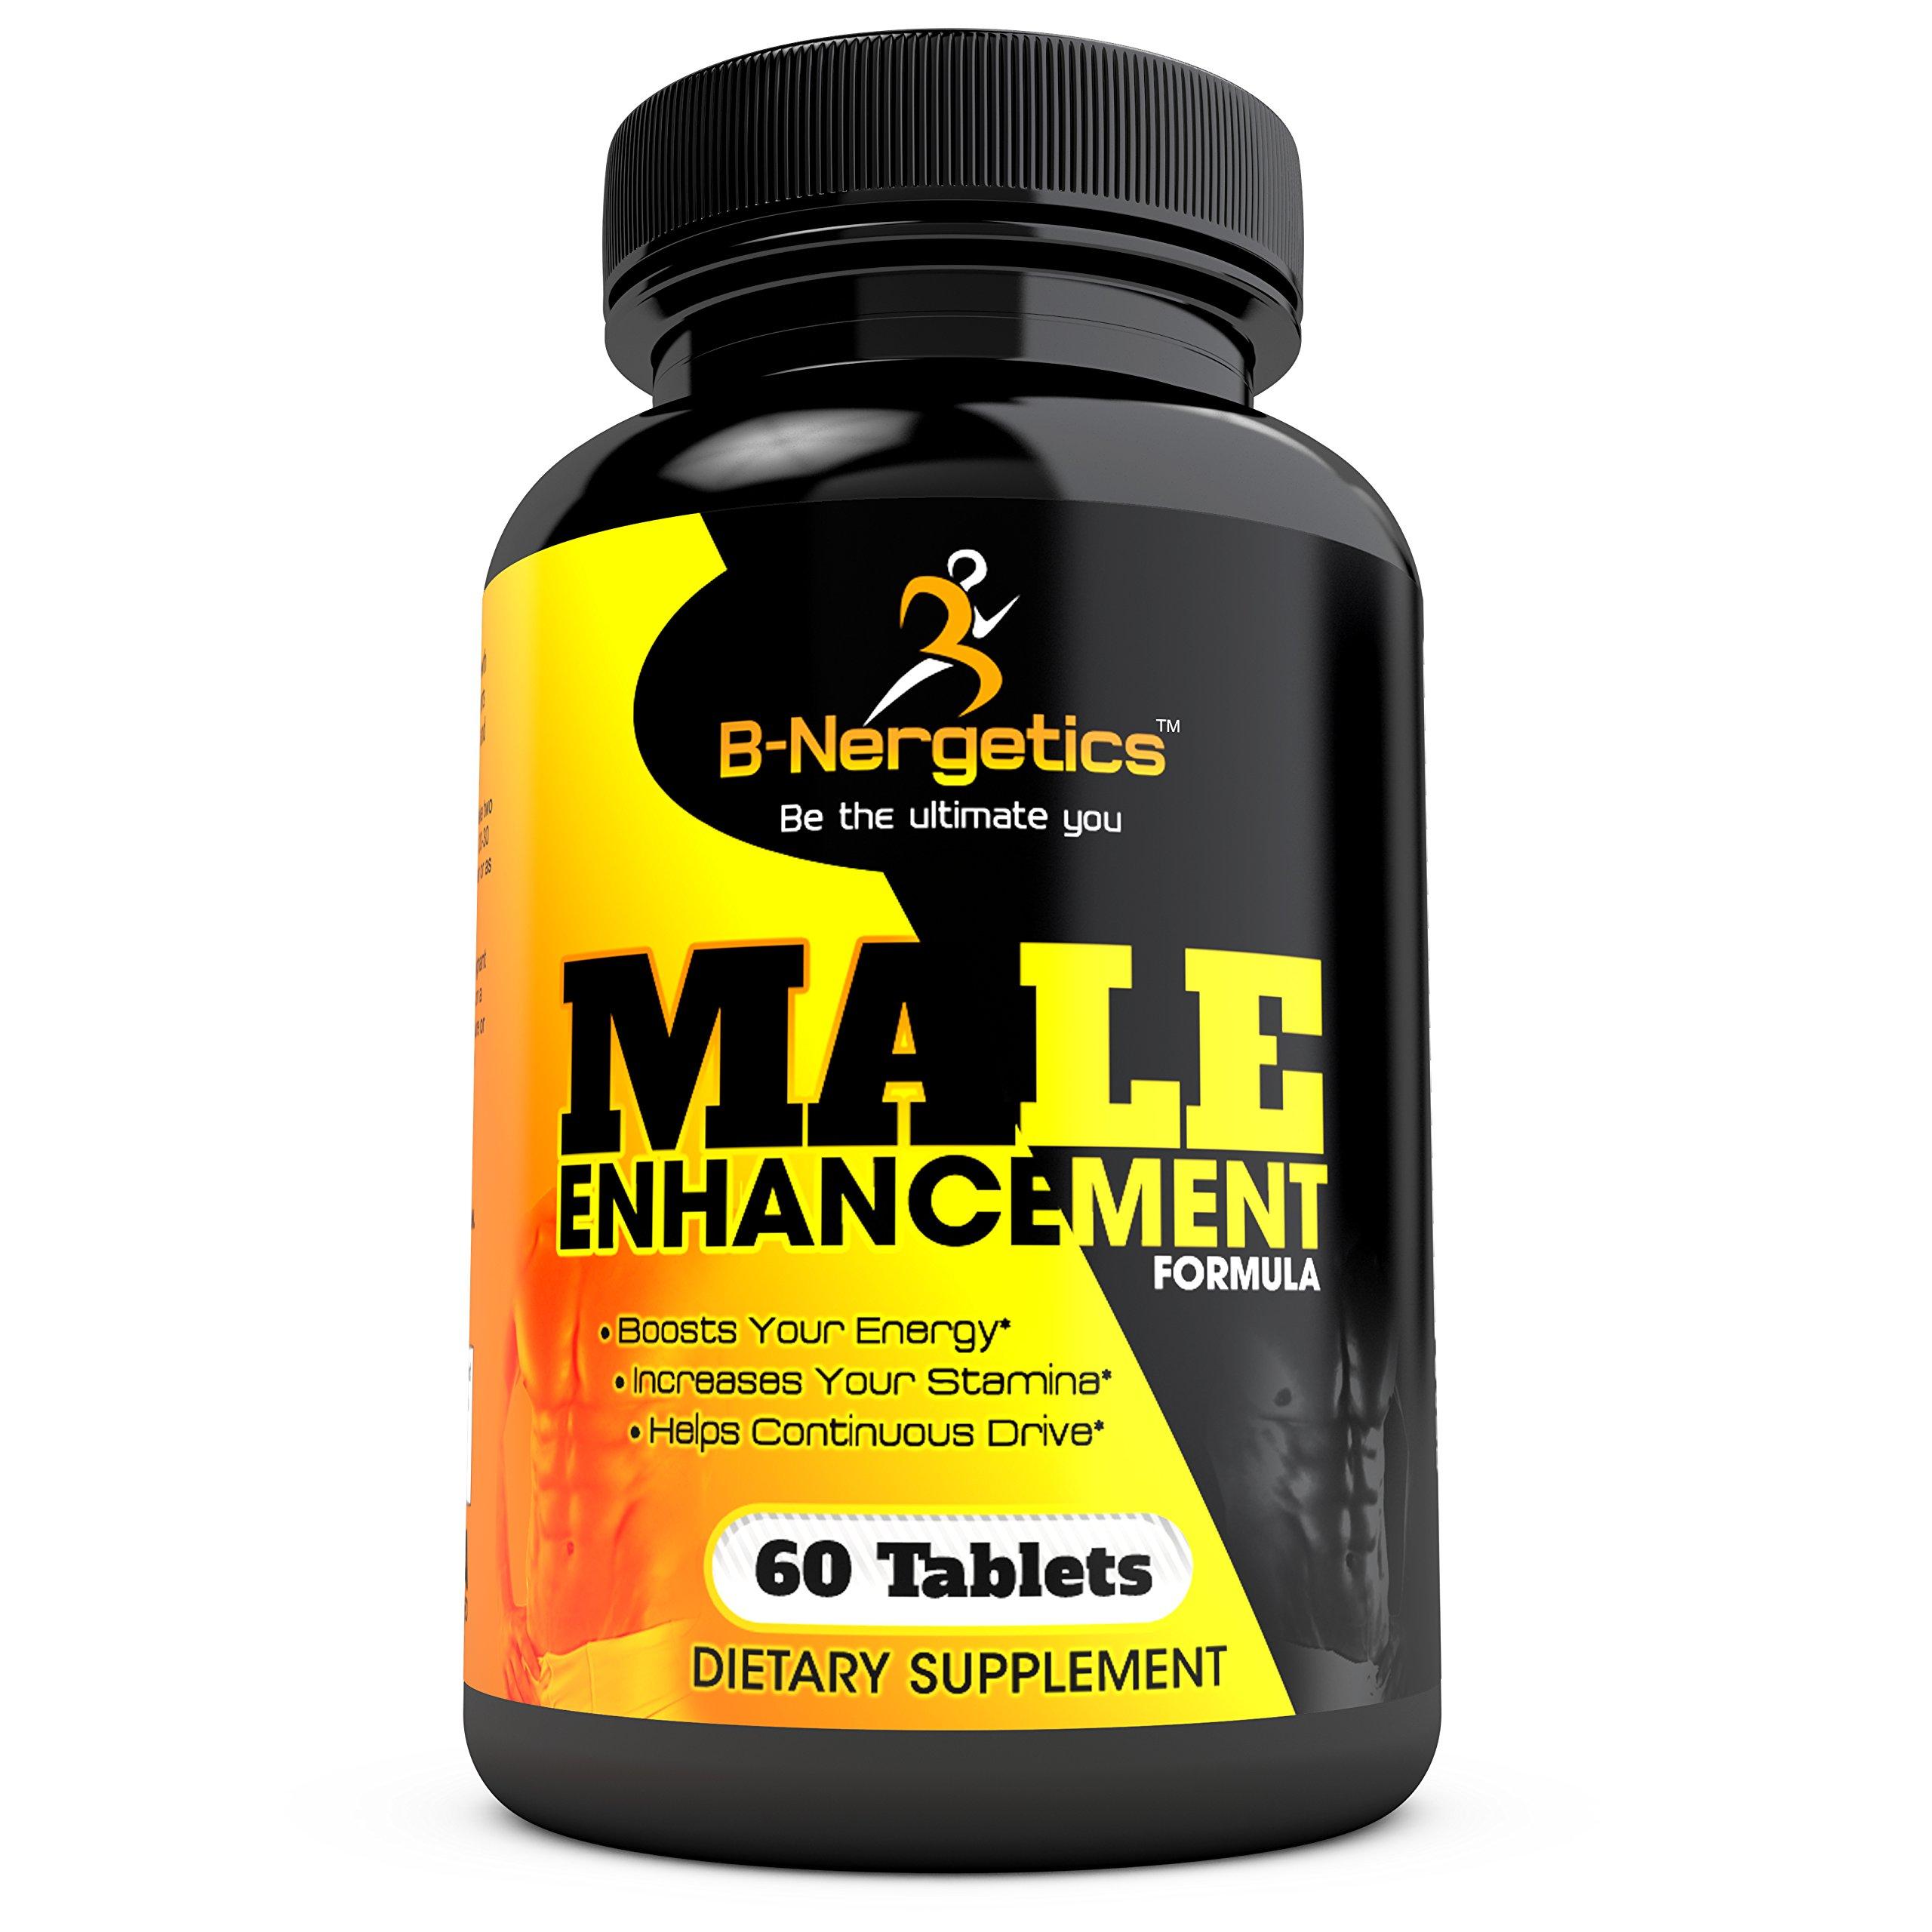 Male Enhancement Supplement - Natural Testosterone Booster Formula with Maca, Tribulus, L-Arginine, Tongkat Ali, Ginseng, Zinc, by B-Nergetics - 60 Tablets